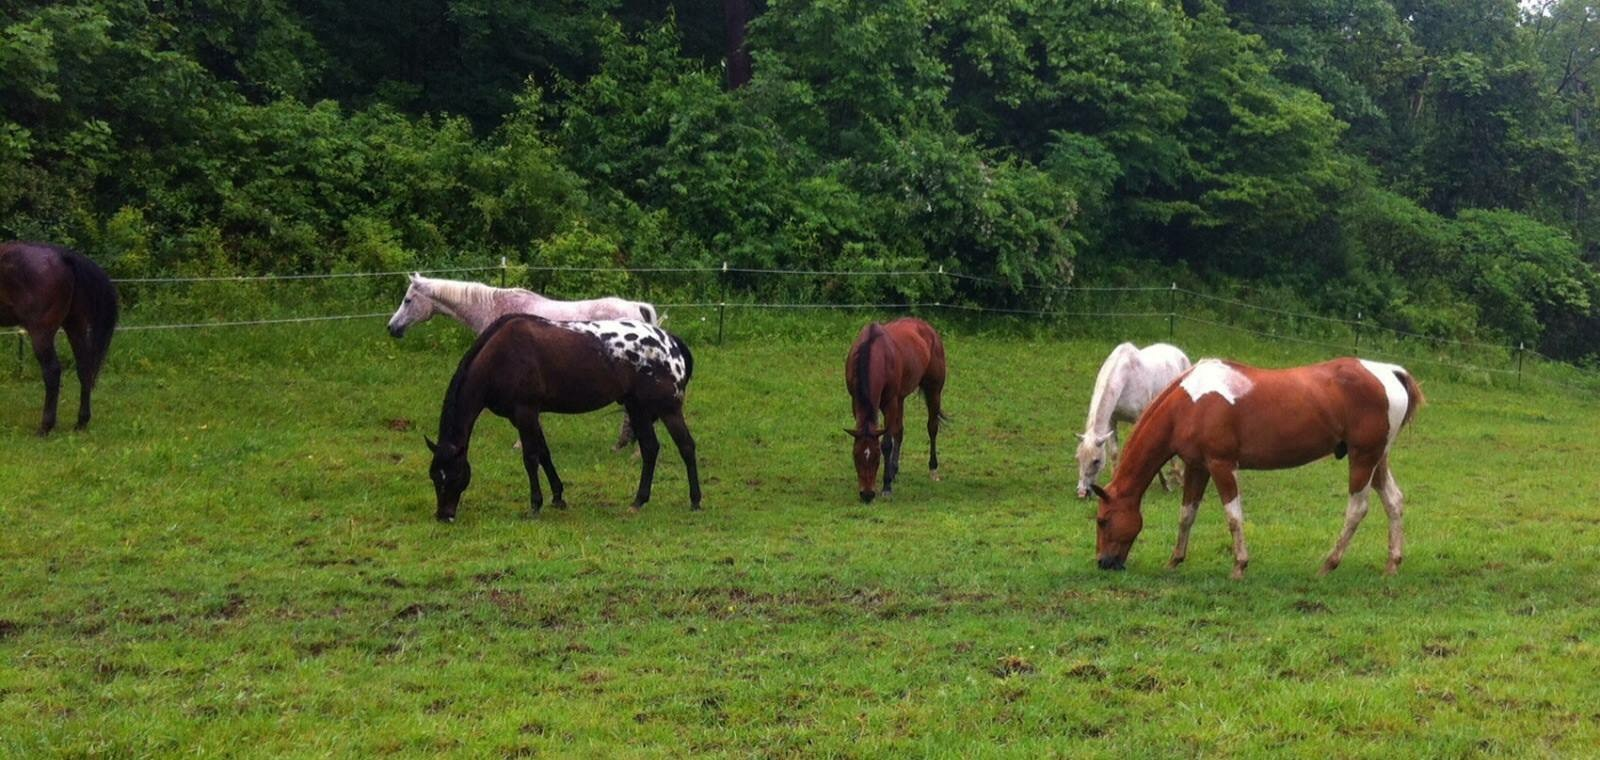 White Horse Farm Kennel Hinckley Oh